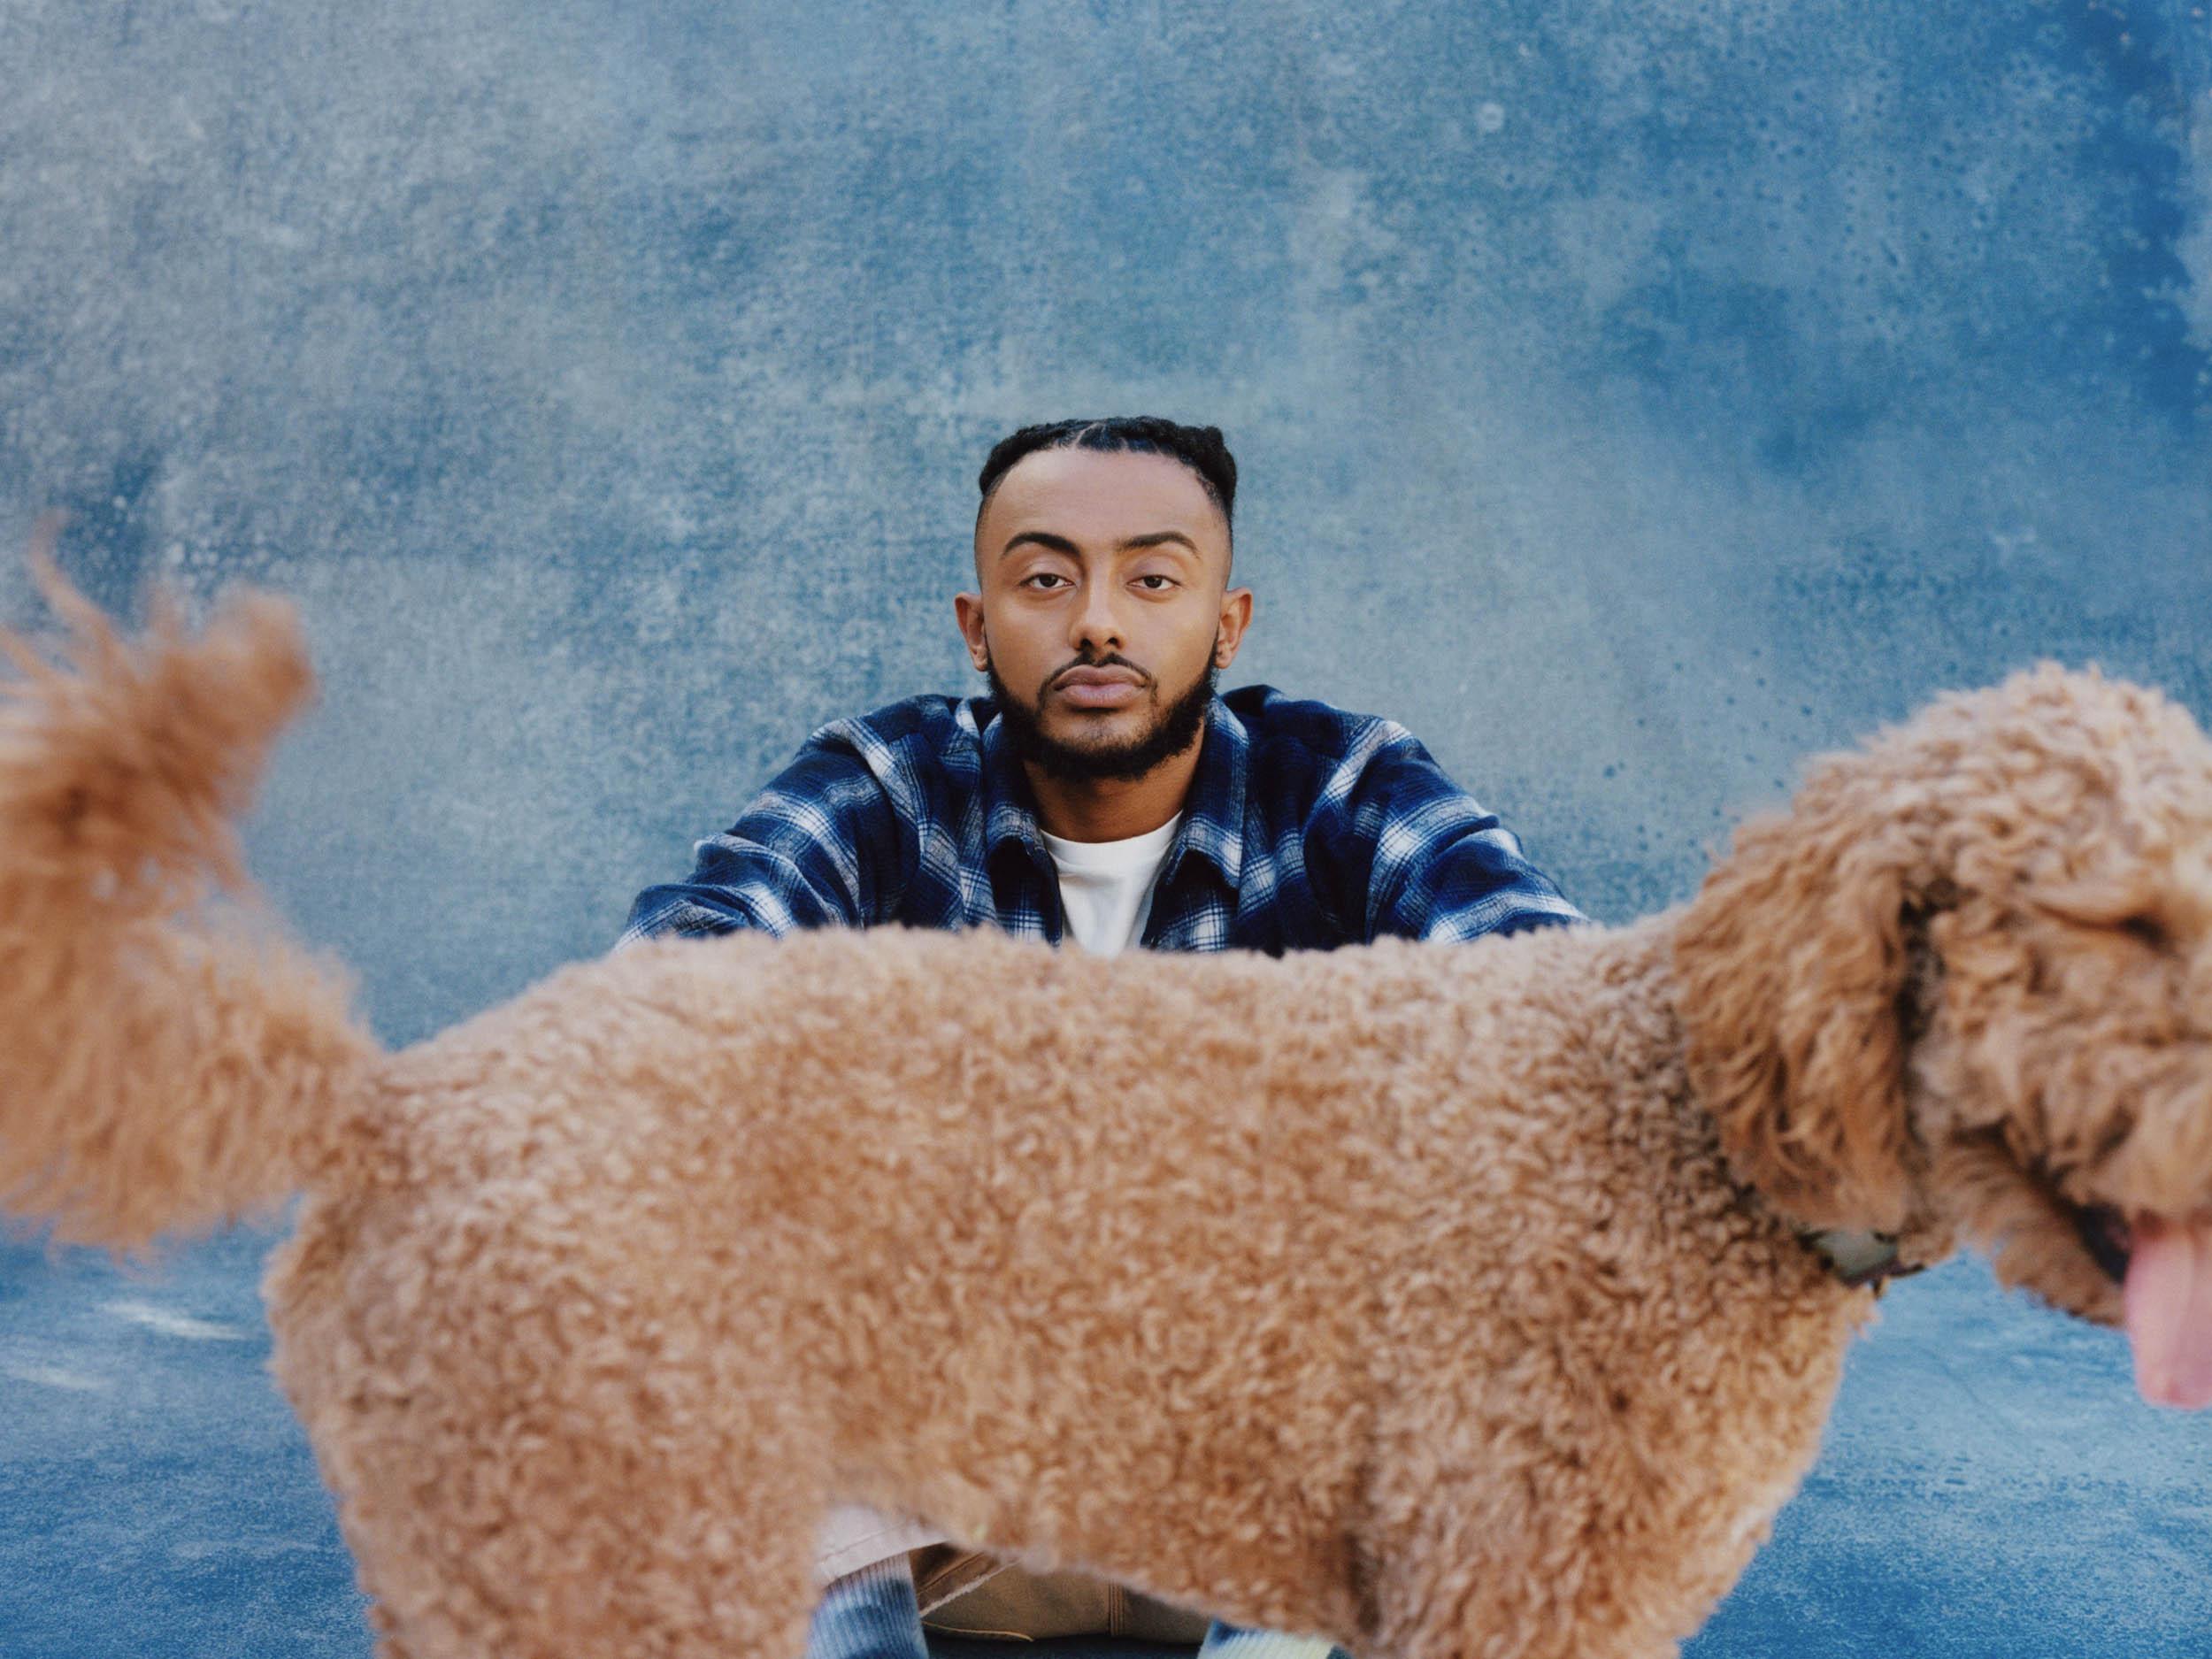 Portland rapper Aminé reignites his hometown's indie-rock roots